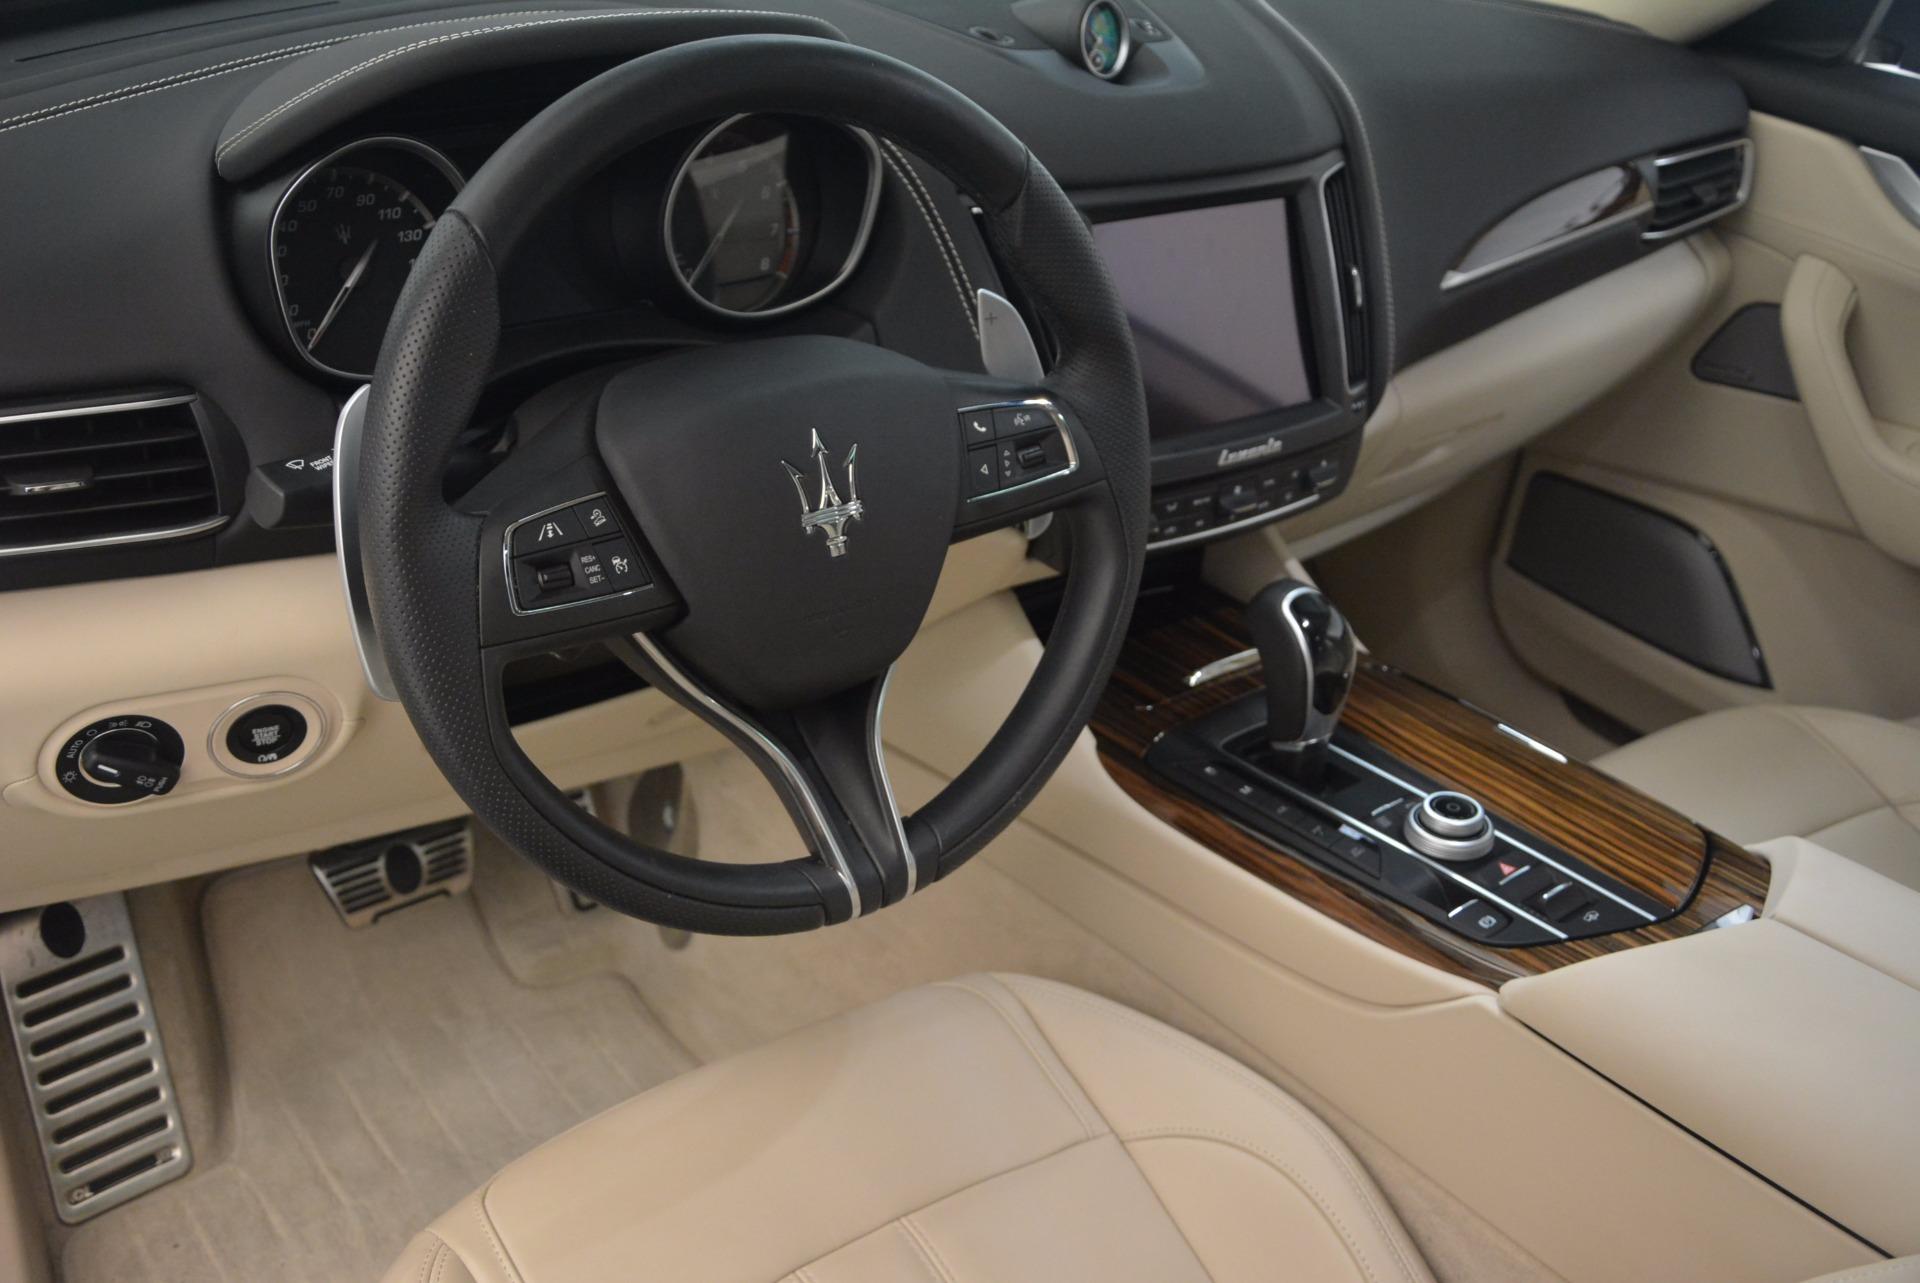 Used 2017 Maserati Levante S For Sale In Westport, CT 1463_p13